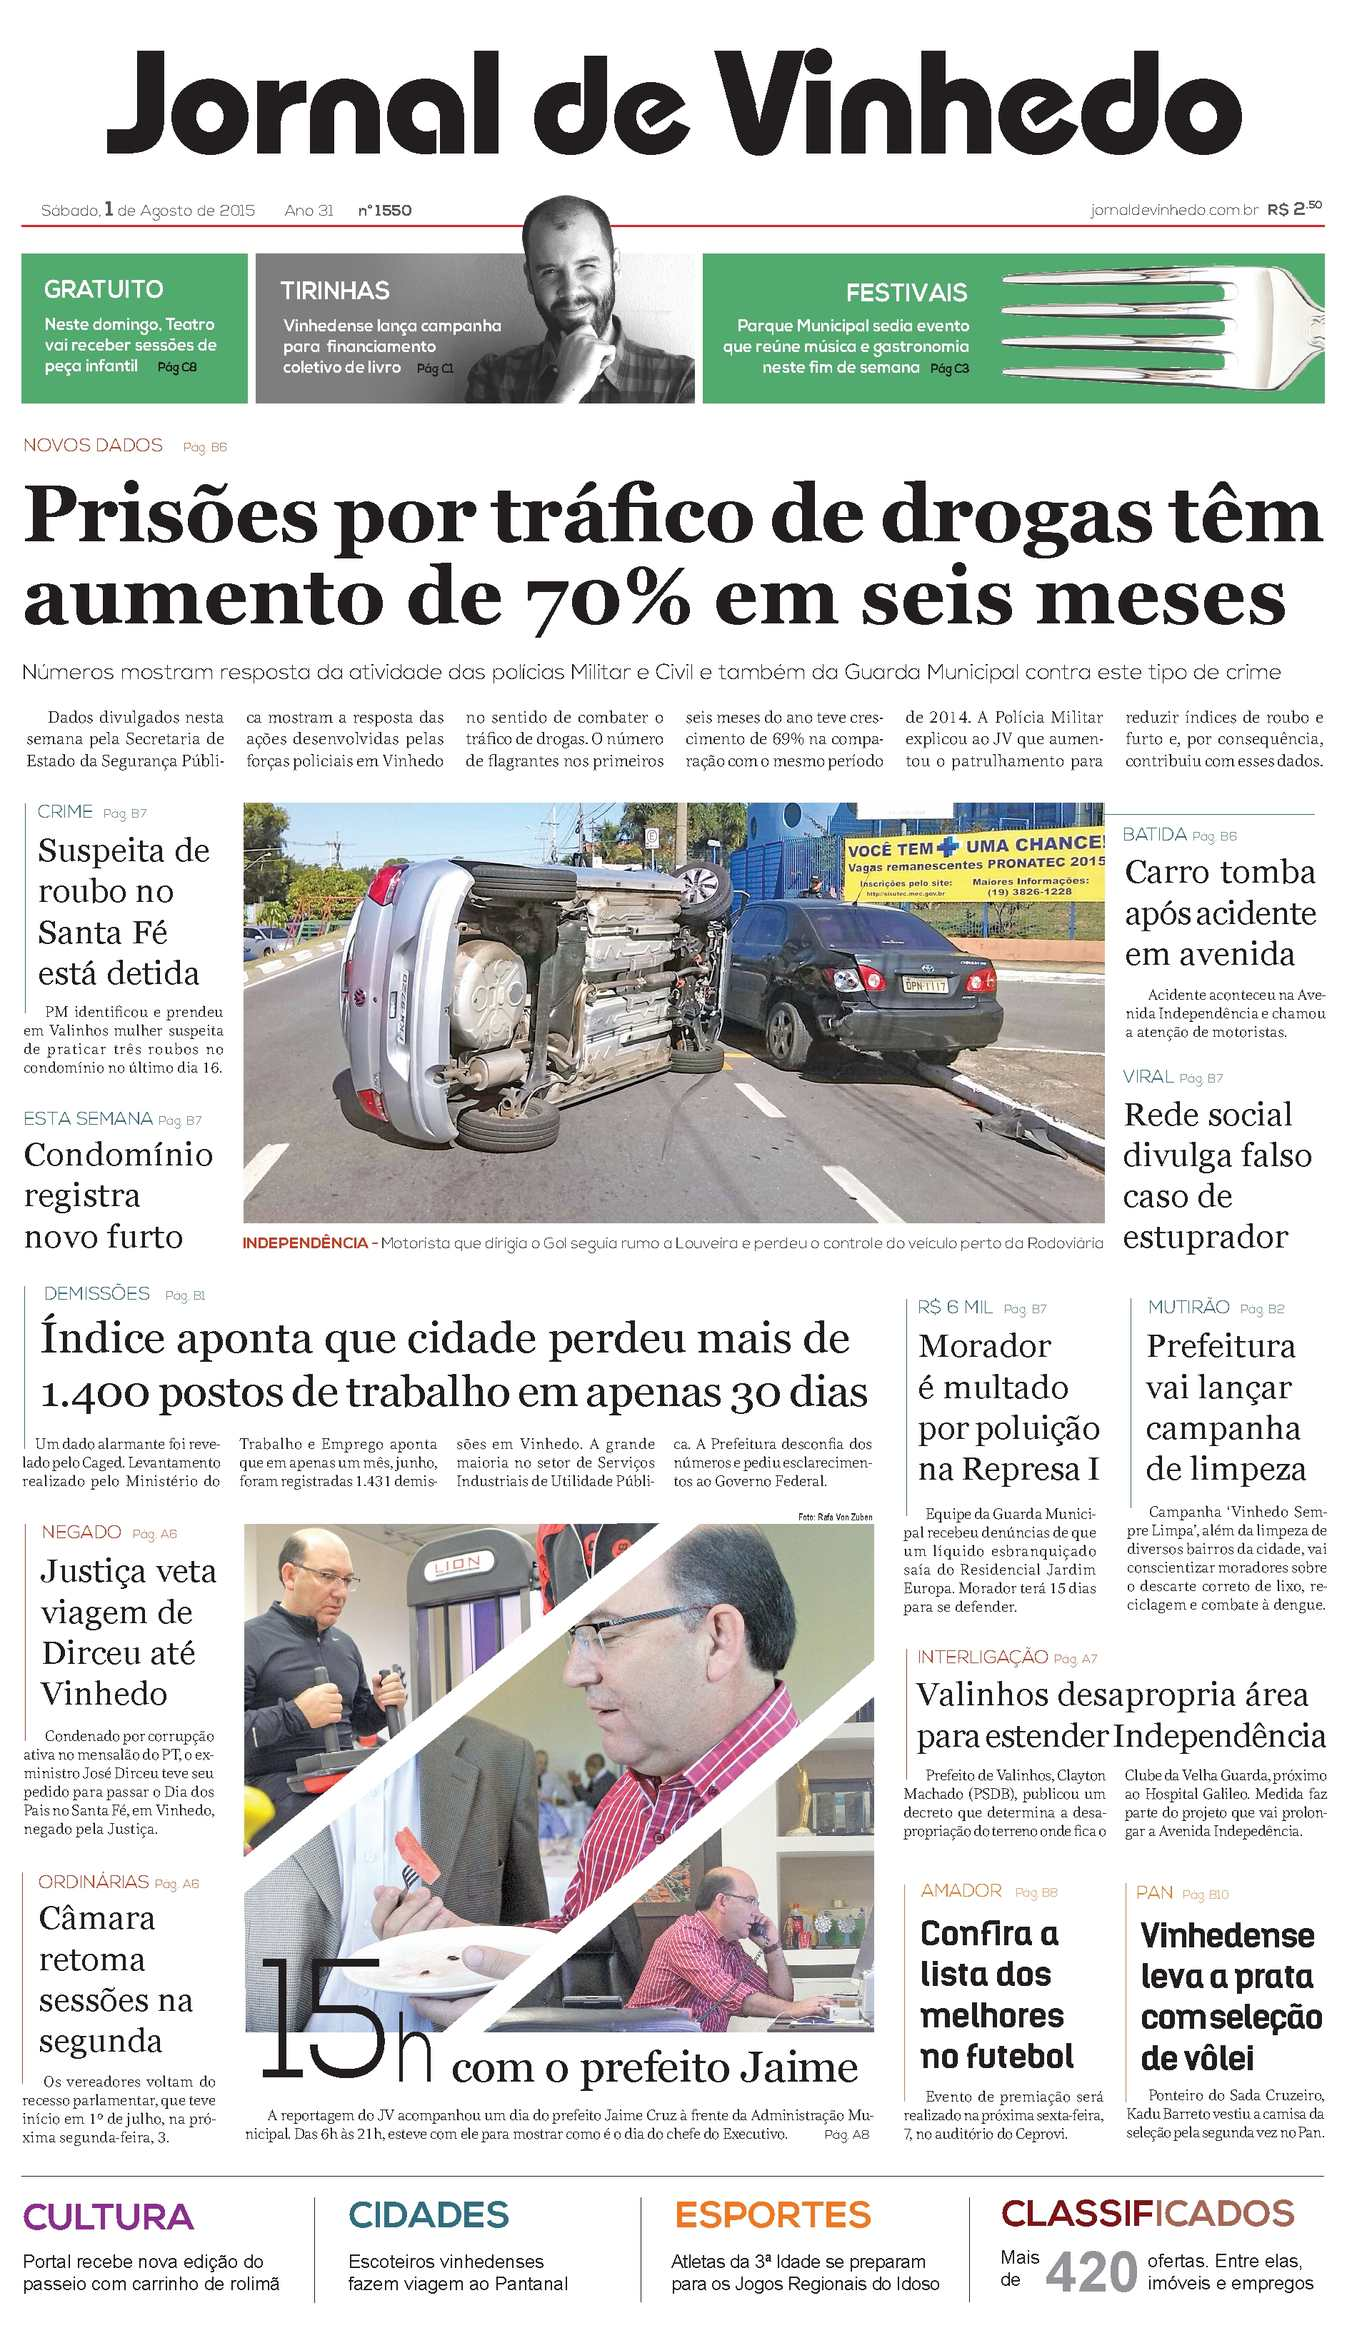 ea411ae4ac675 Calaméo - Jornal De Vinhedo Sábado, 01 De Agosto De 2015 Edic1550